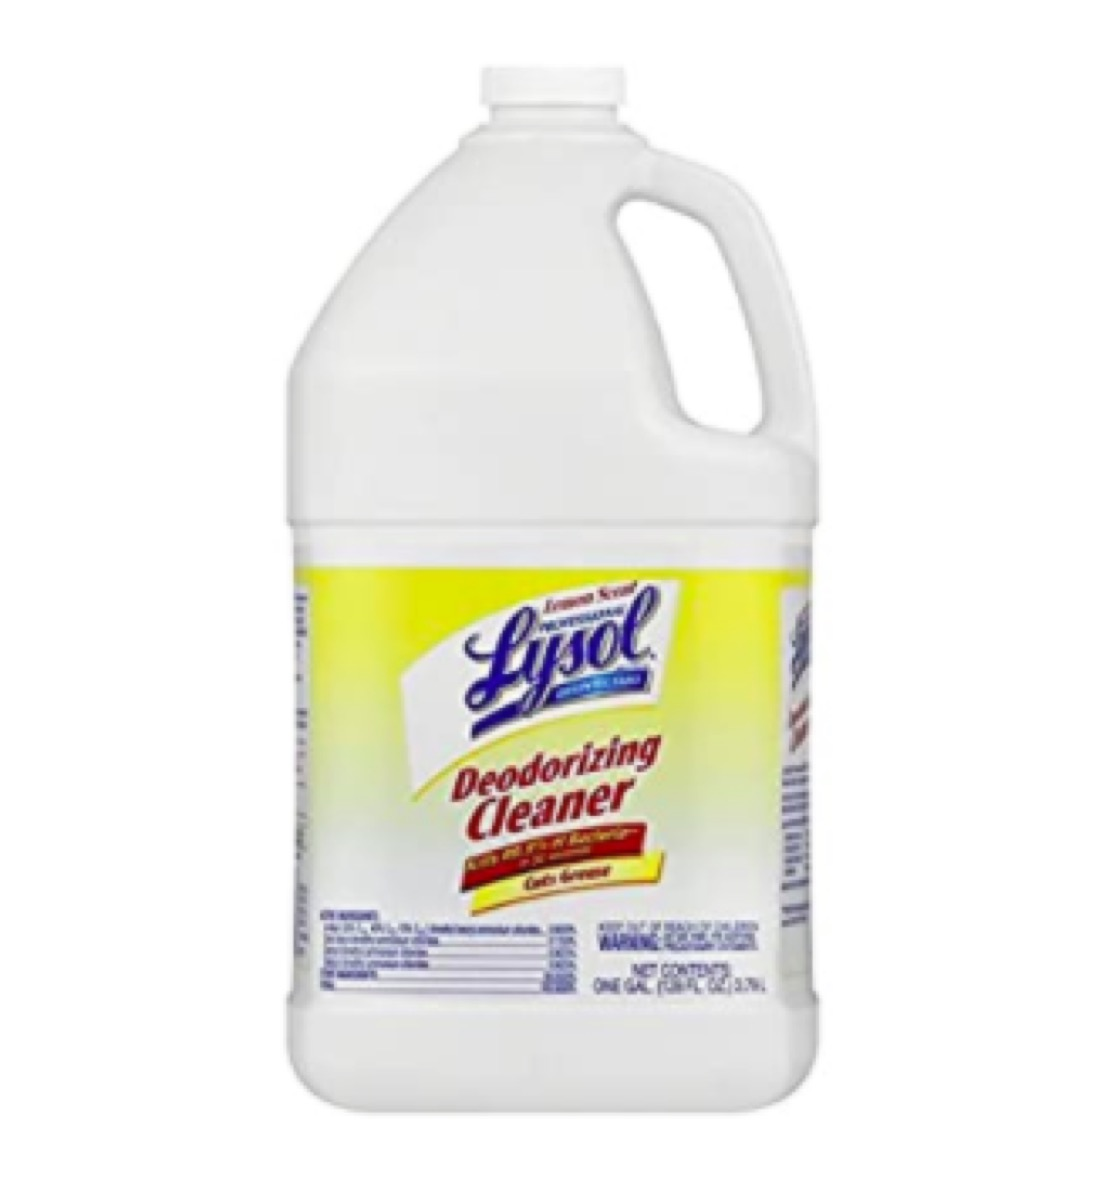 Lysol Brand Deodorizing Disinfectant Cleaner